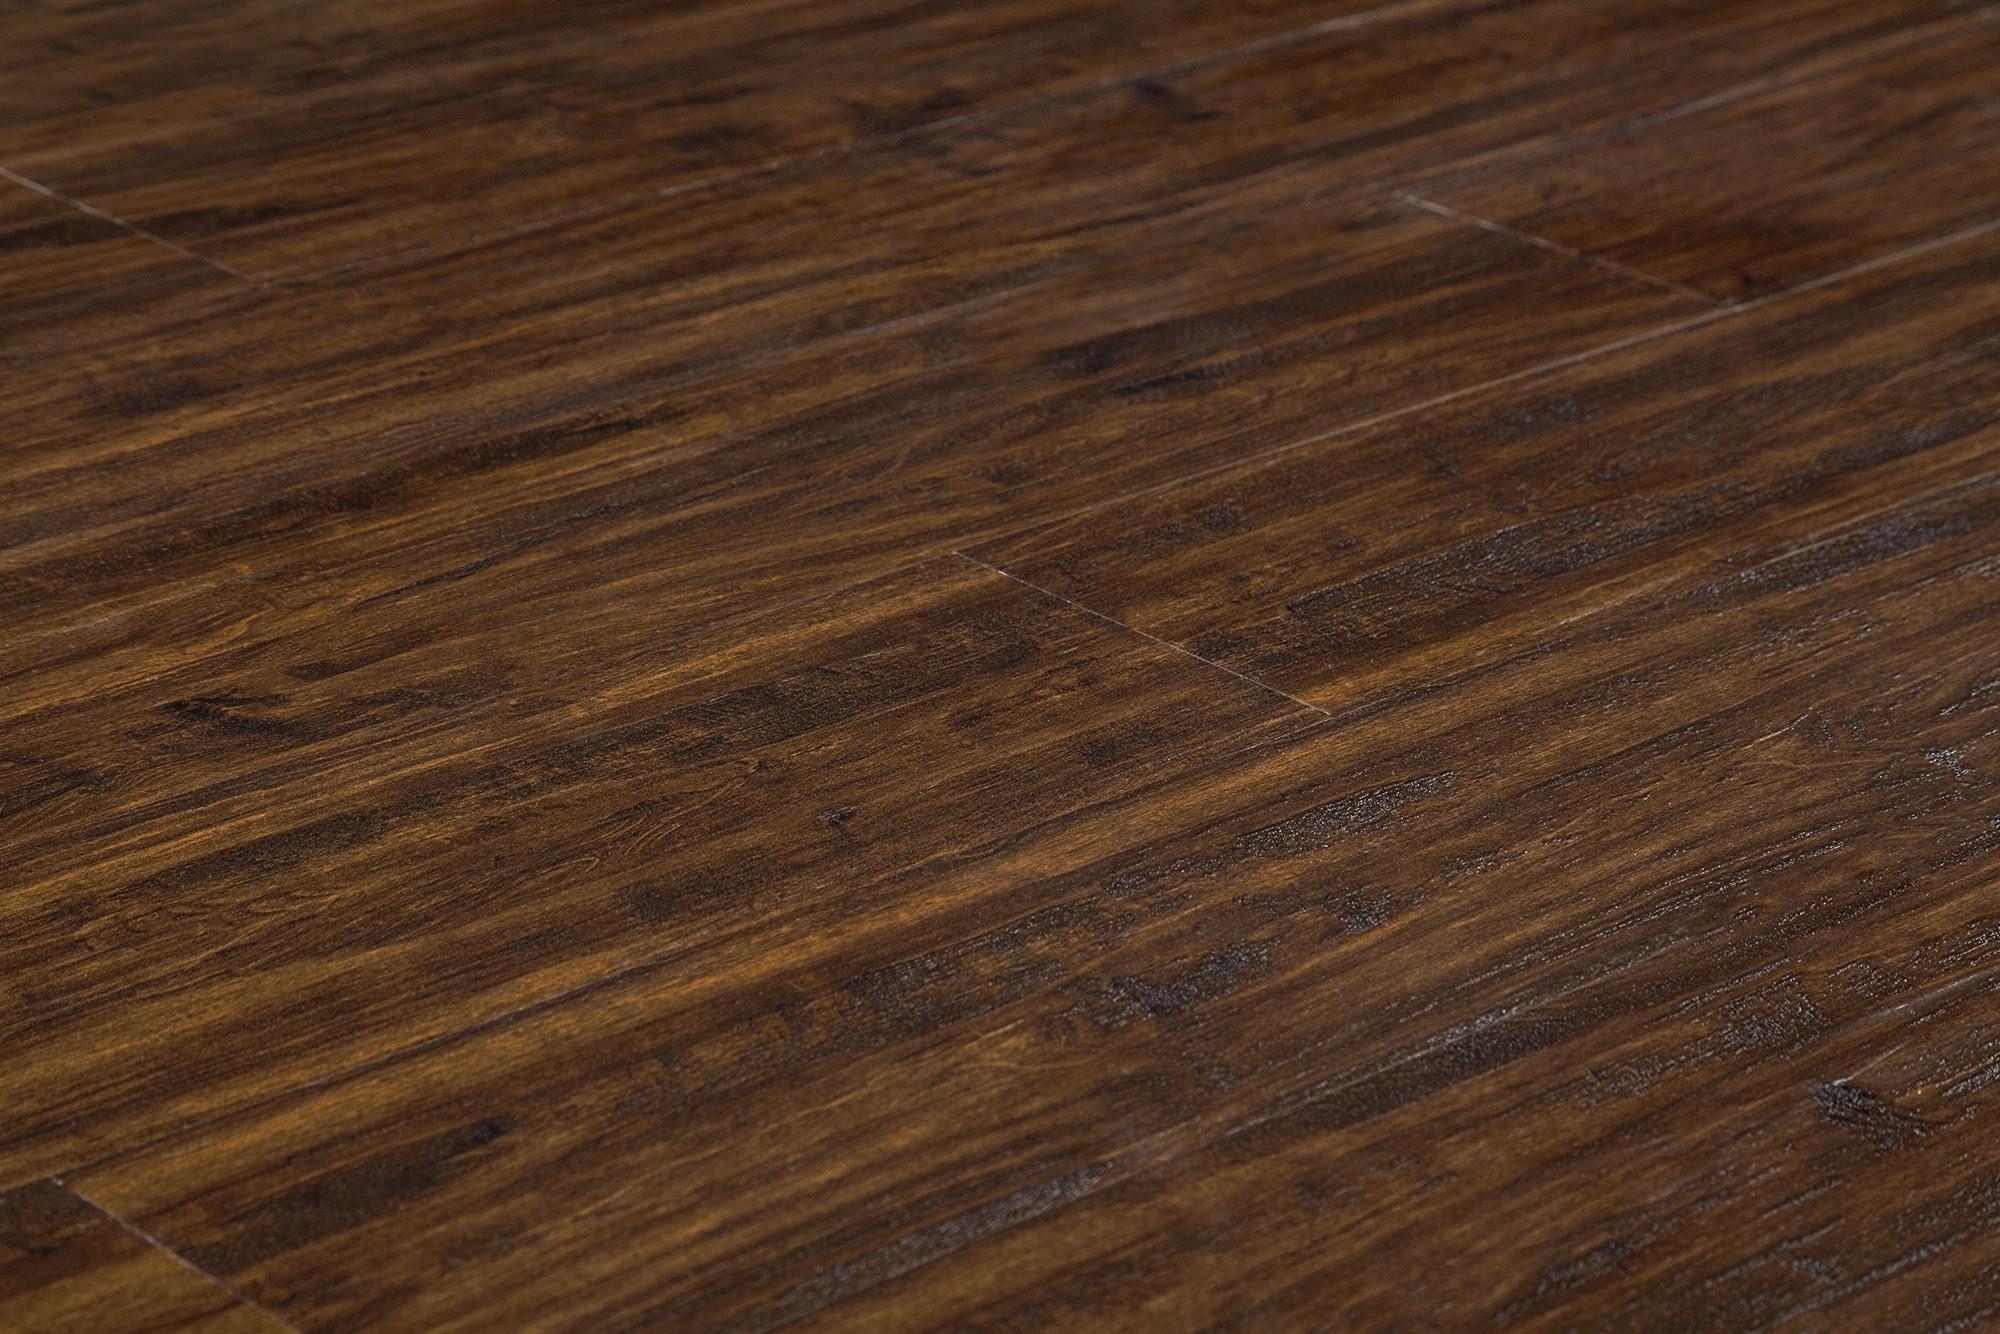 FREE Samples: Vesdura Vinyl Planks   5mm PVC Click Lock   Renaissance  Collection Sienna / 5mm / PVC / Click Lock